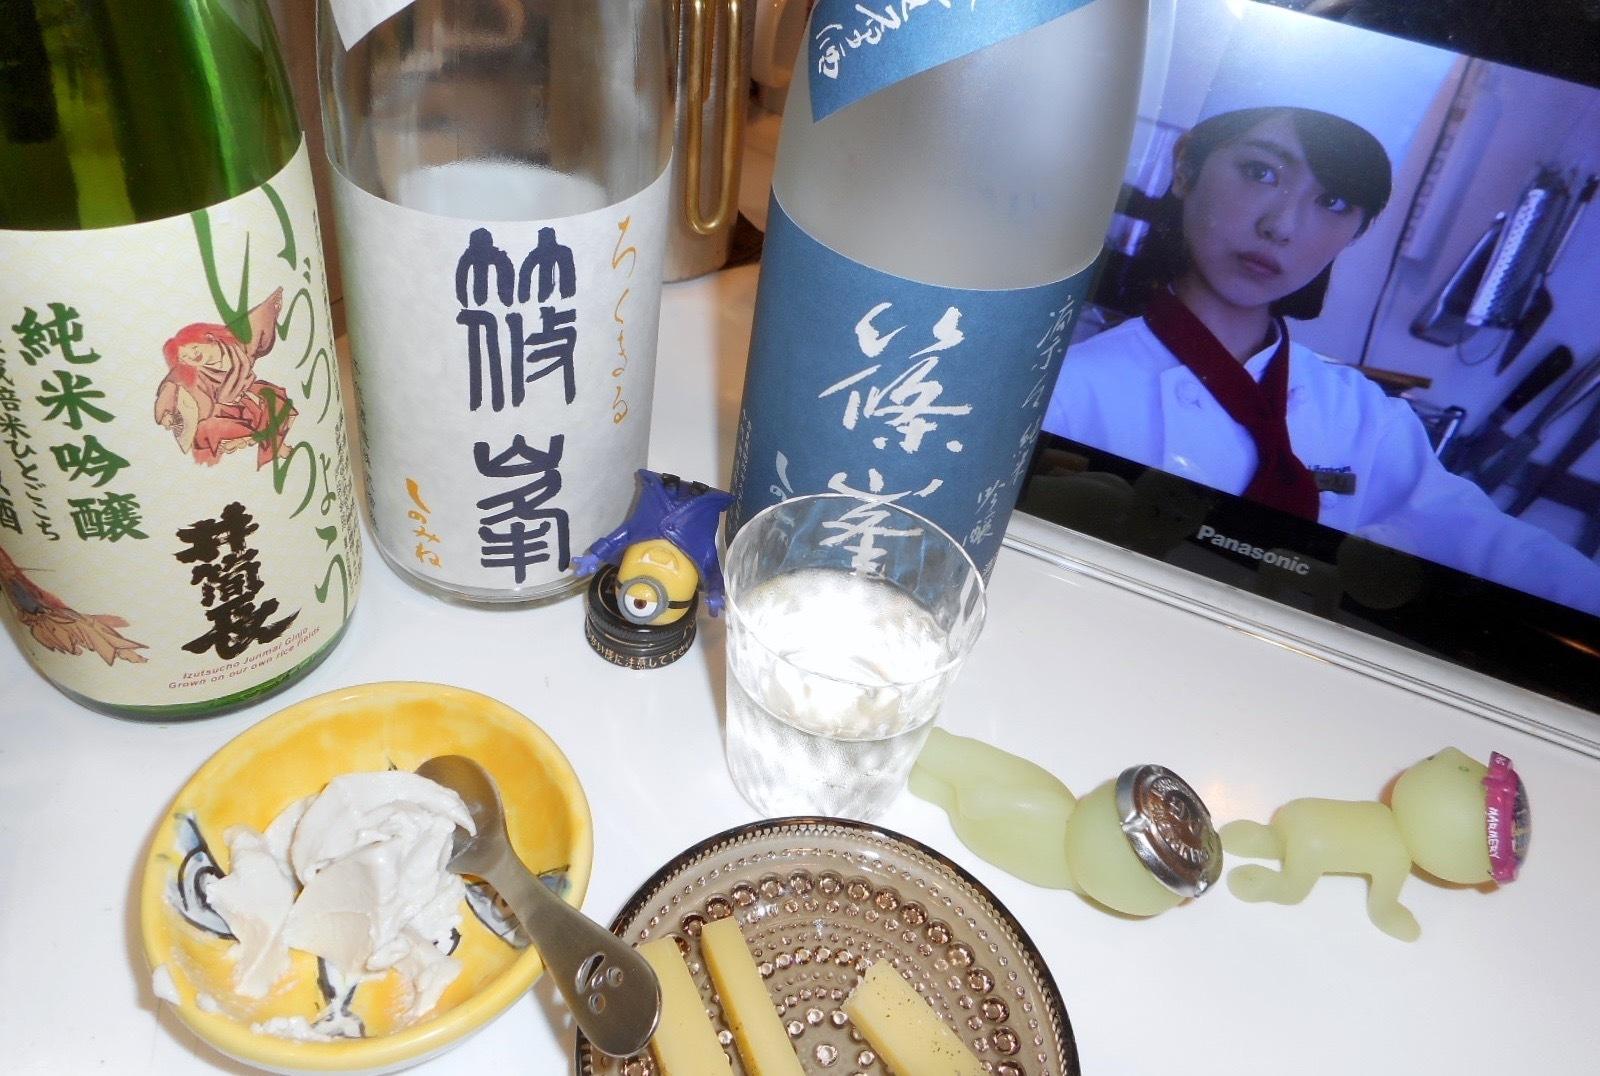 izutsuchou_jikagumi29by2_9.jpg